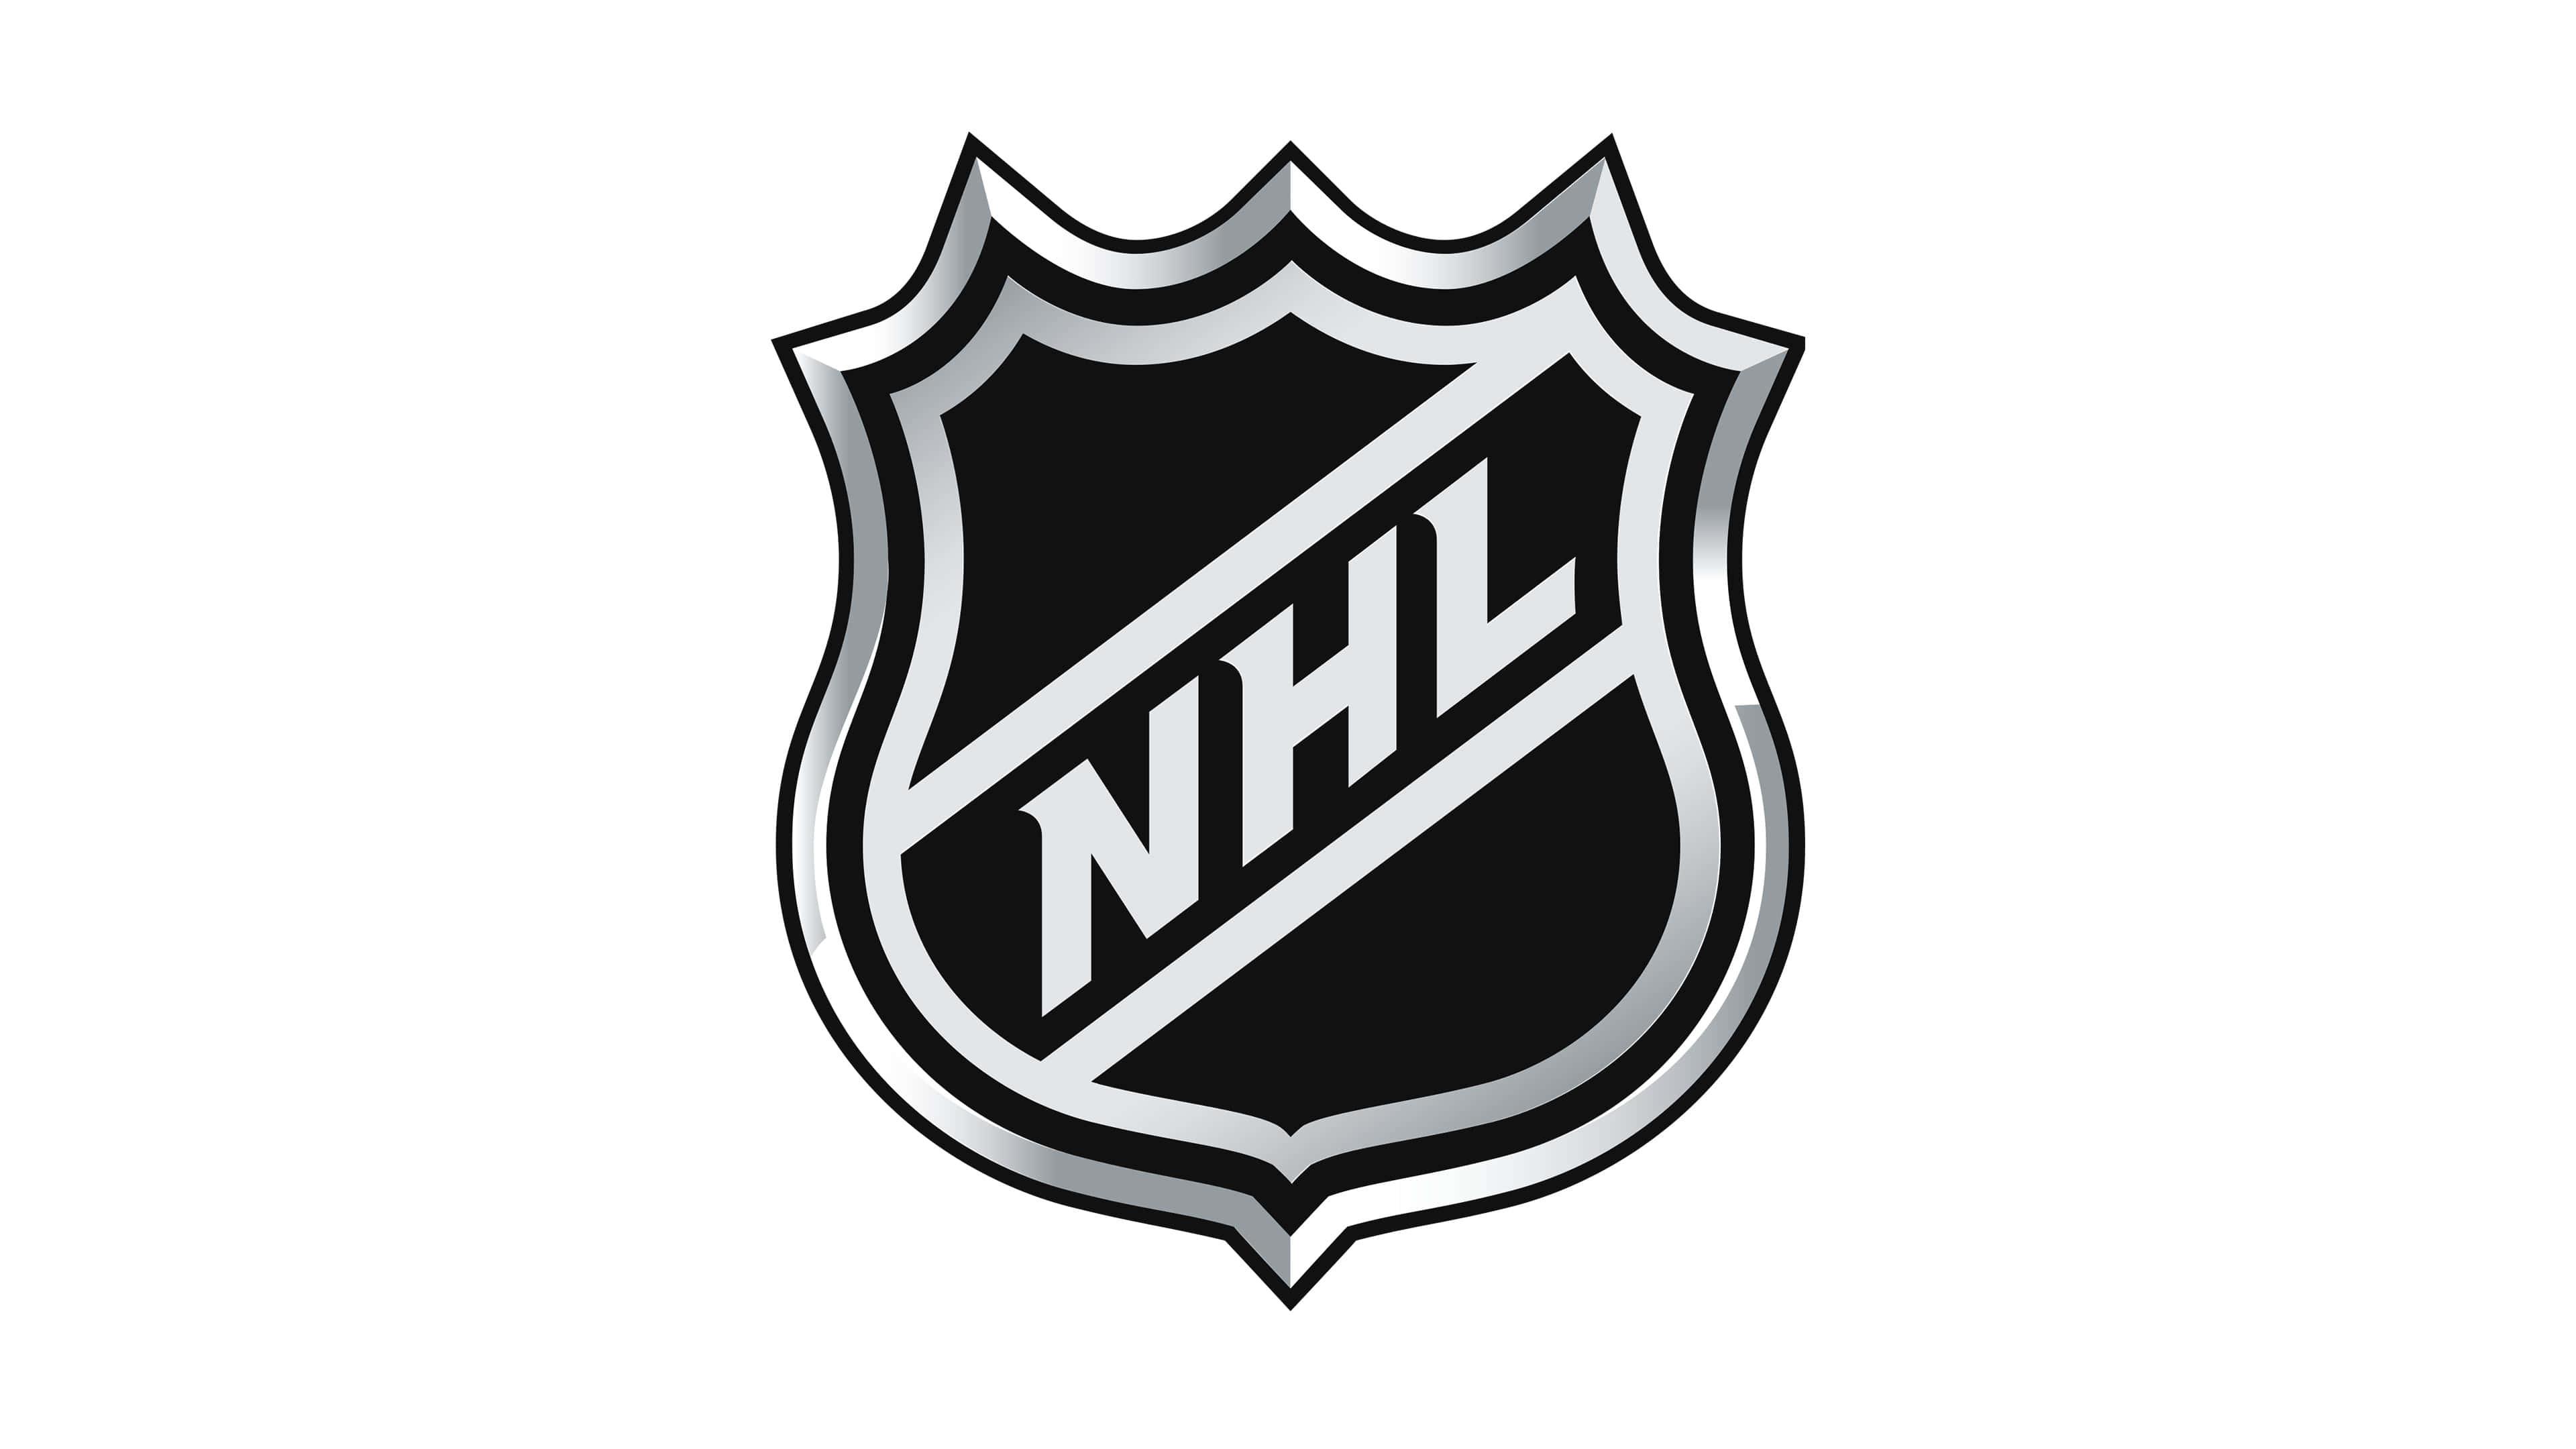 National Hockey League Nhl Logo Uhd 4k Wallpaper Pixelz